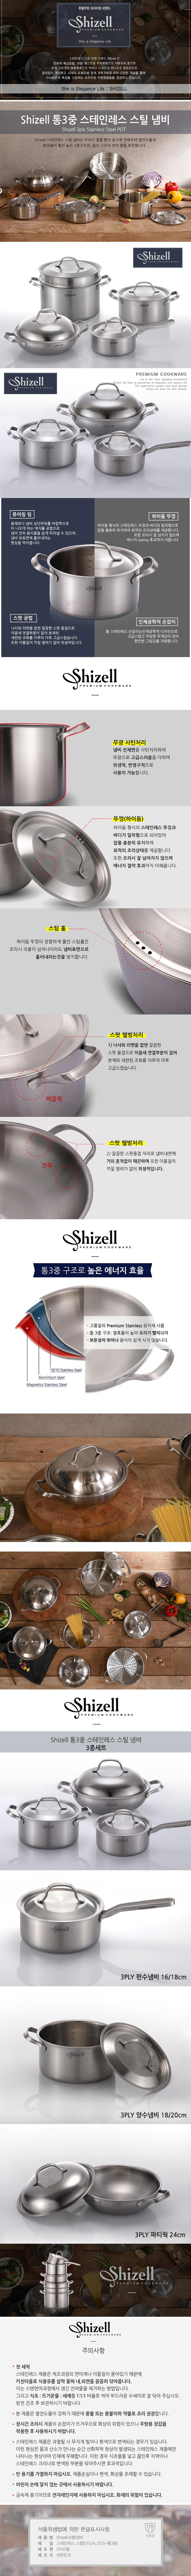 shizell%203PLYpot%203set%20thumb1.jpg